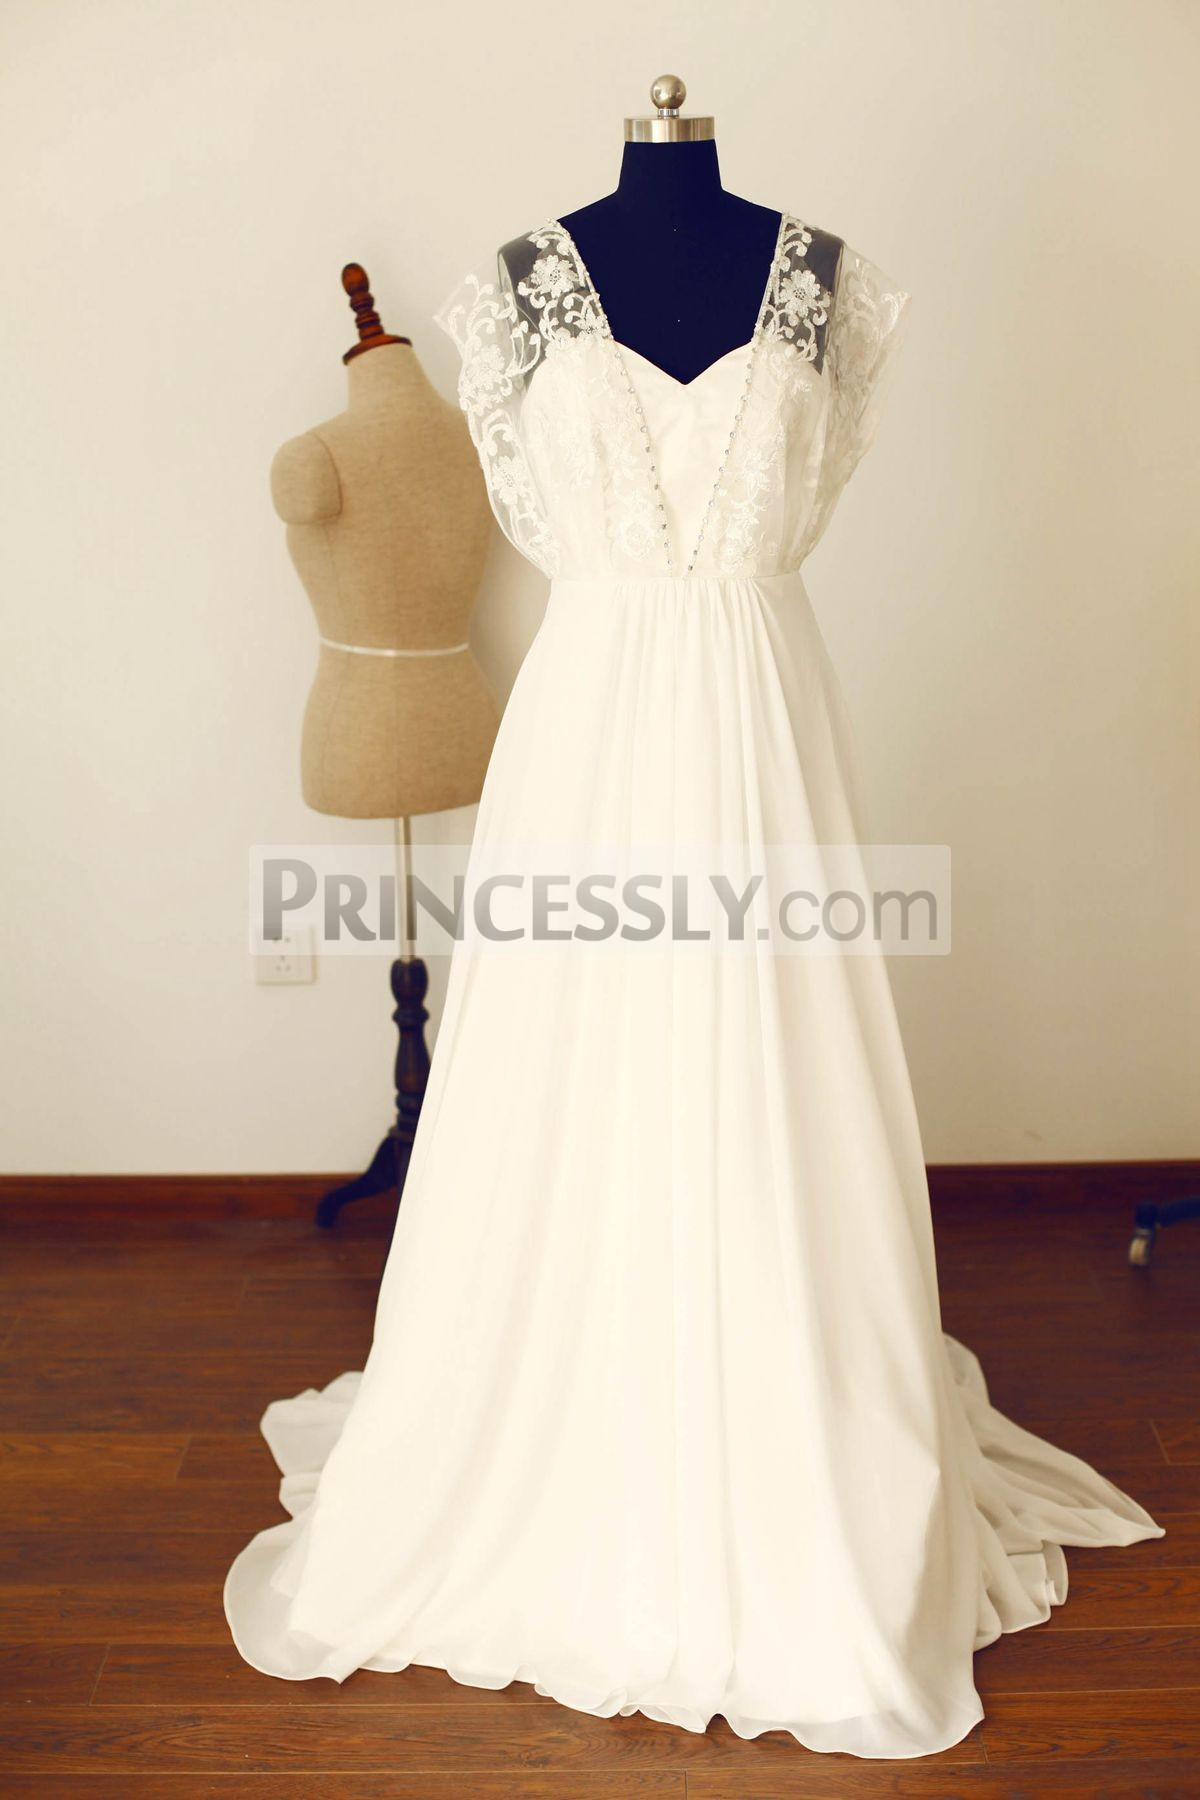 Princessly.com-K1000245-Boho Beach Short Sleeves Ivory Lace Chiffon Long Wedding Dress-31